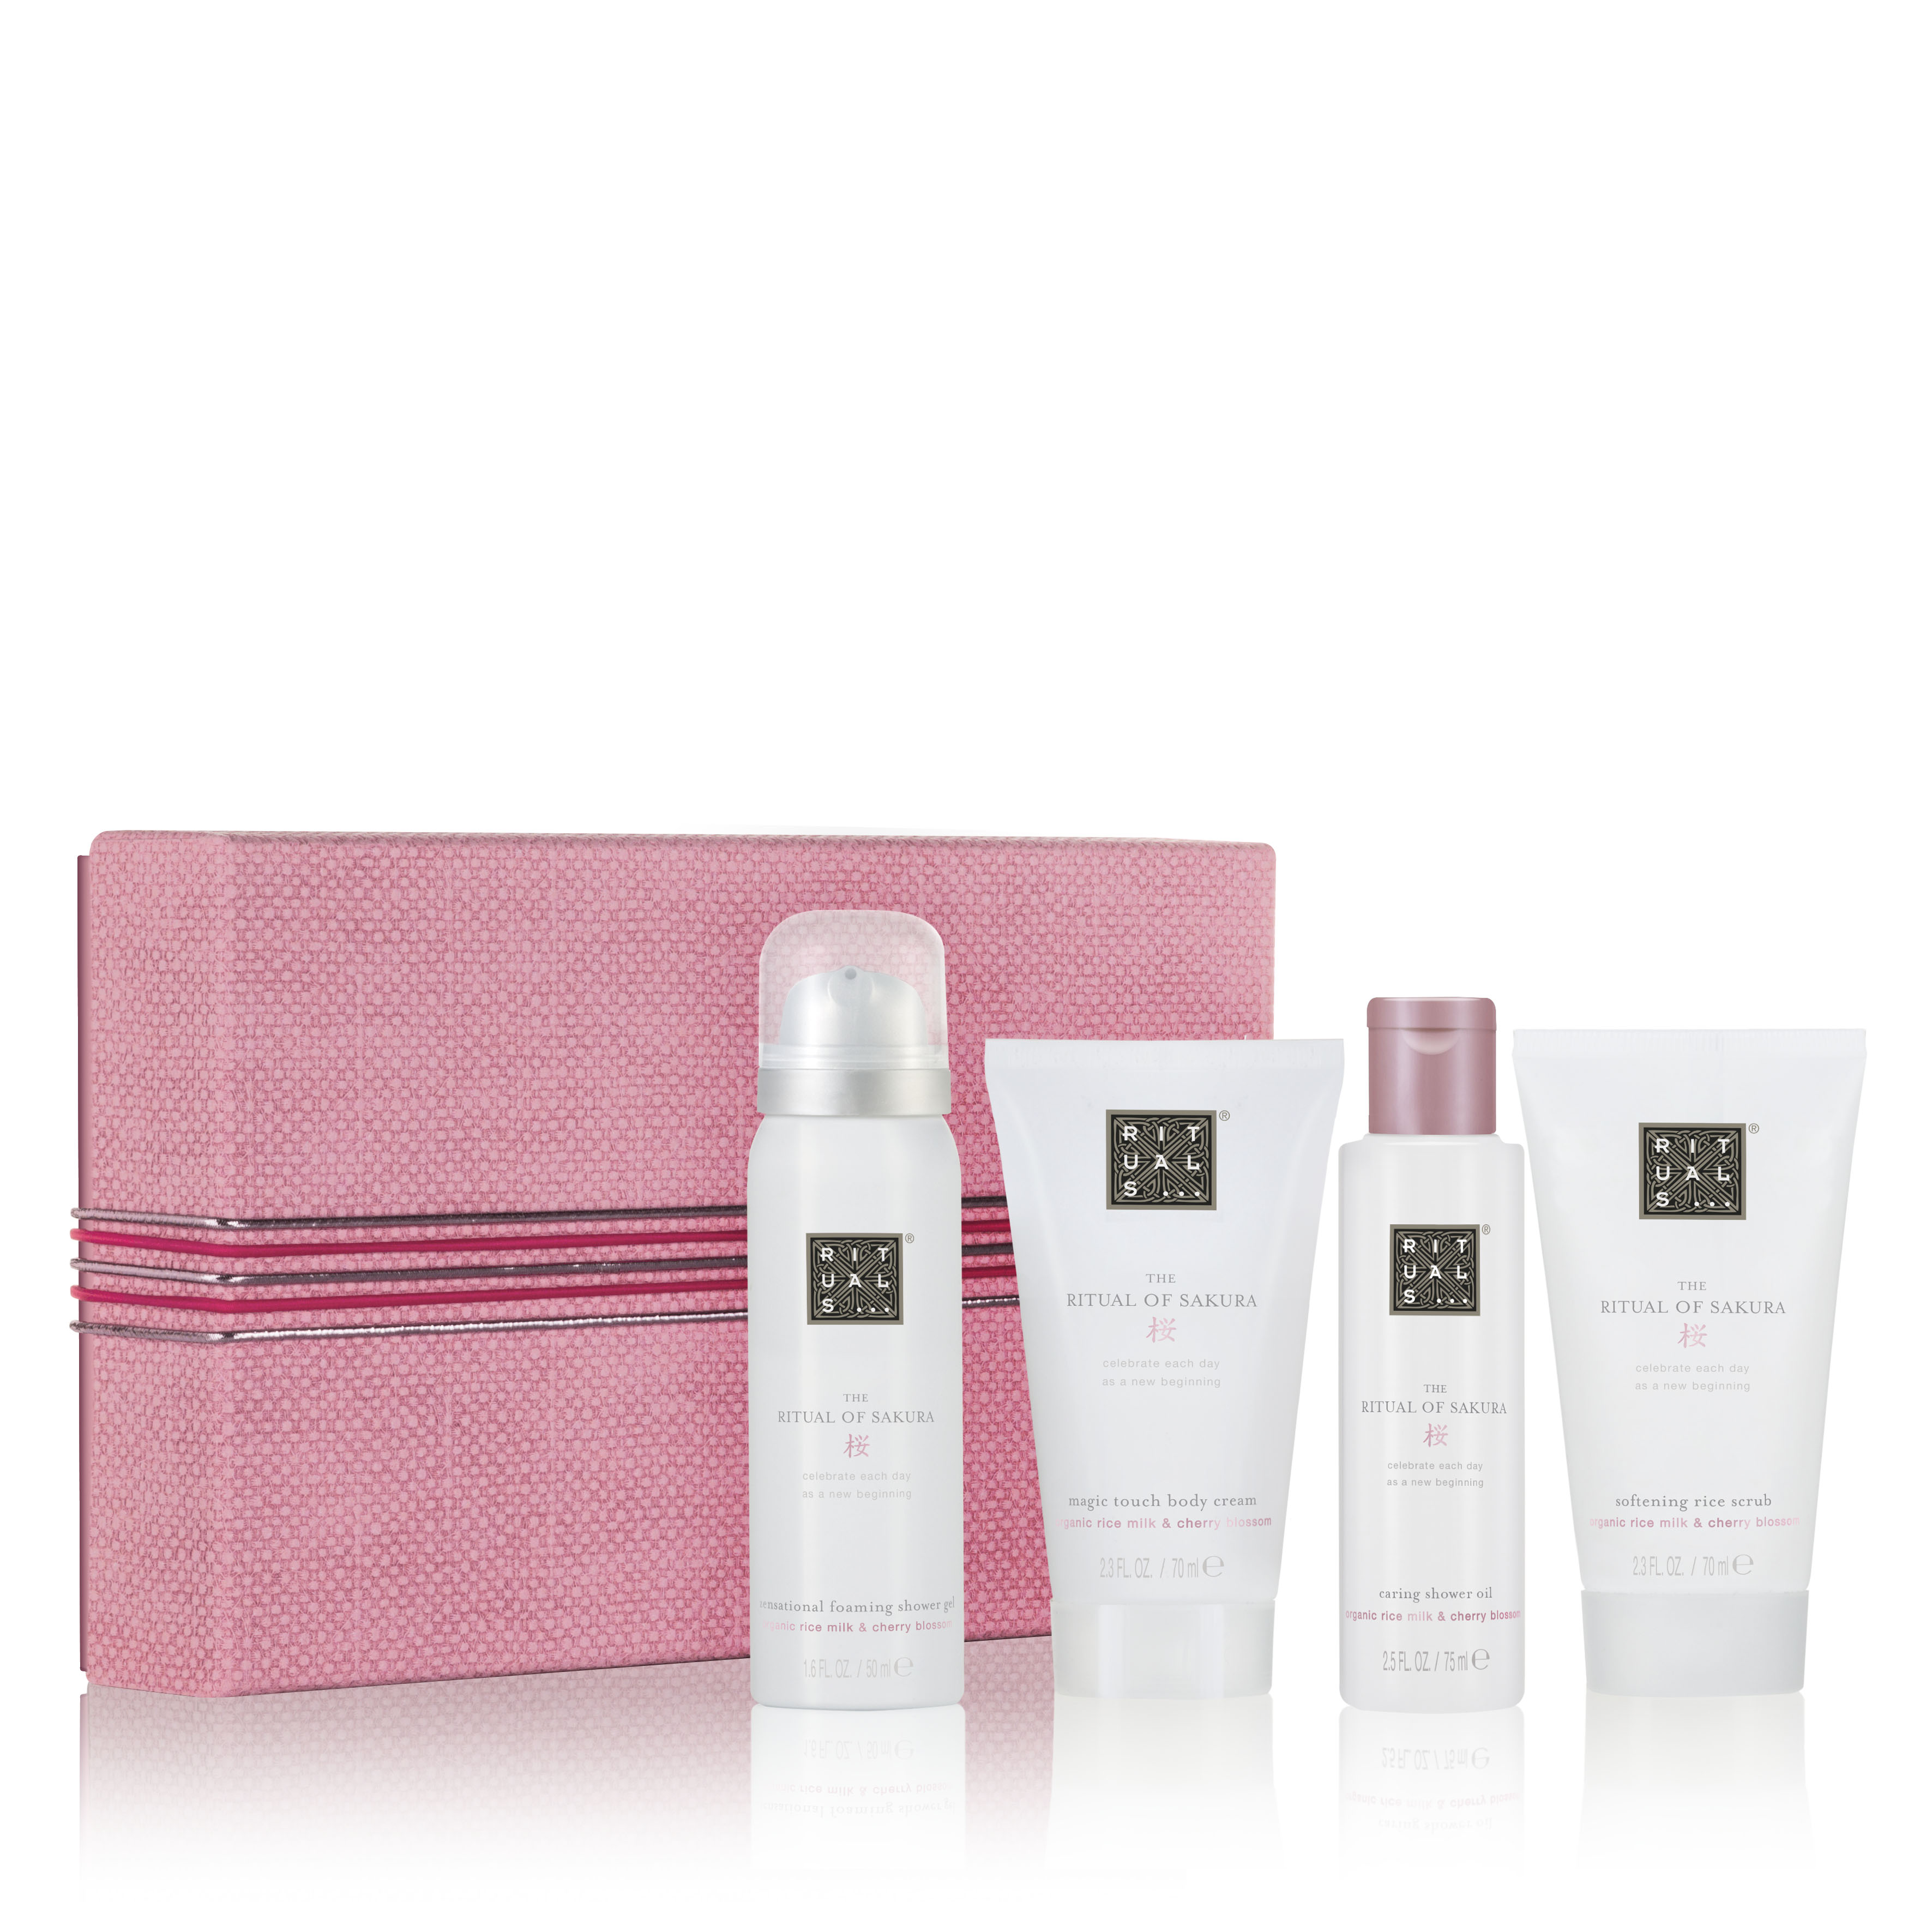 RITUALS The Ritual of Sakura - Relaxing Treat Gift Set